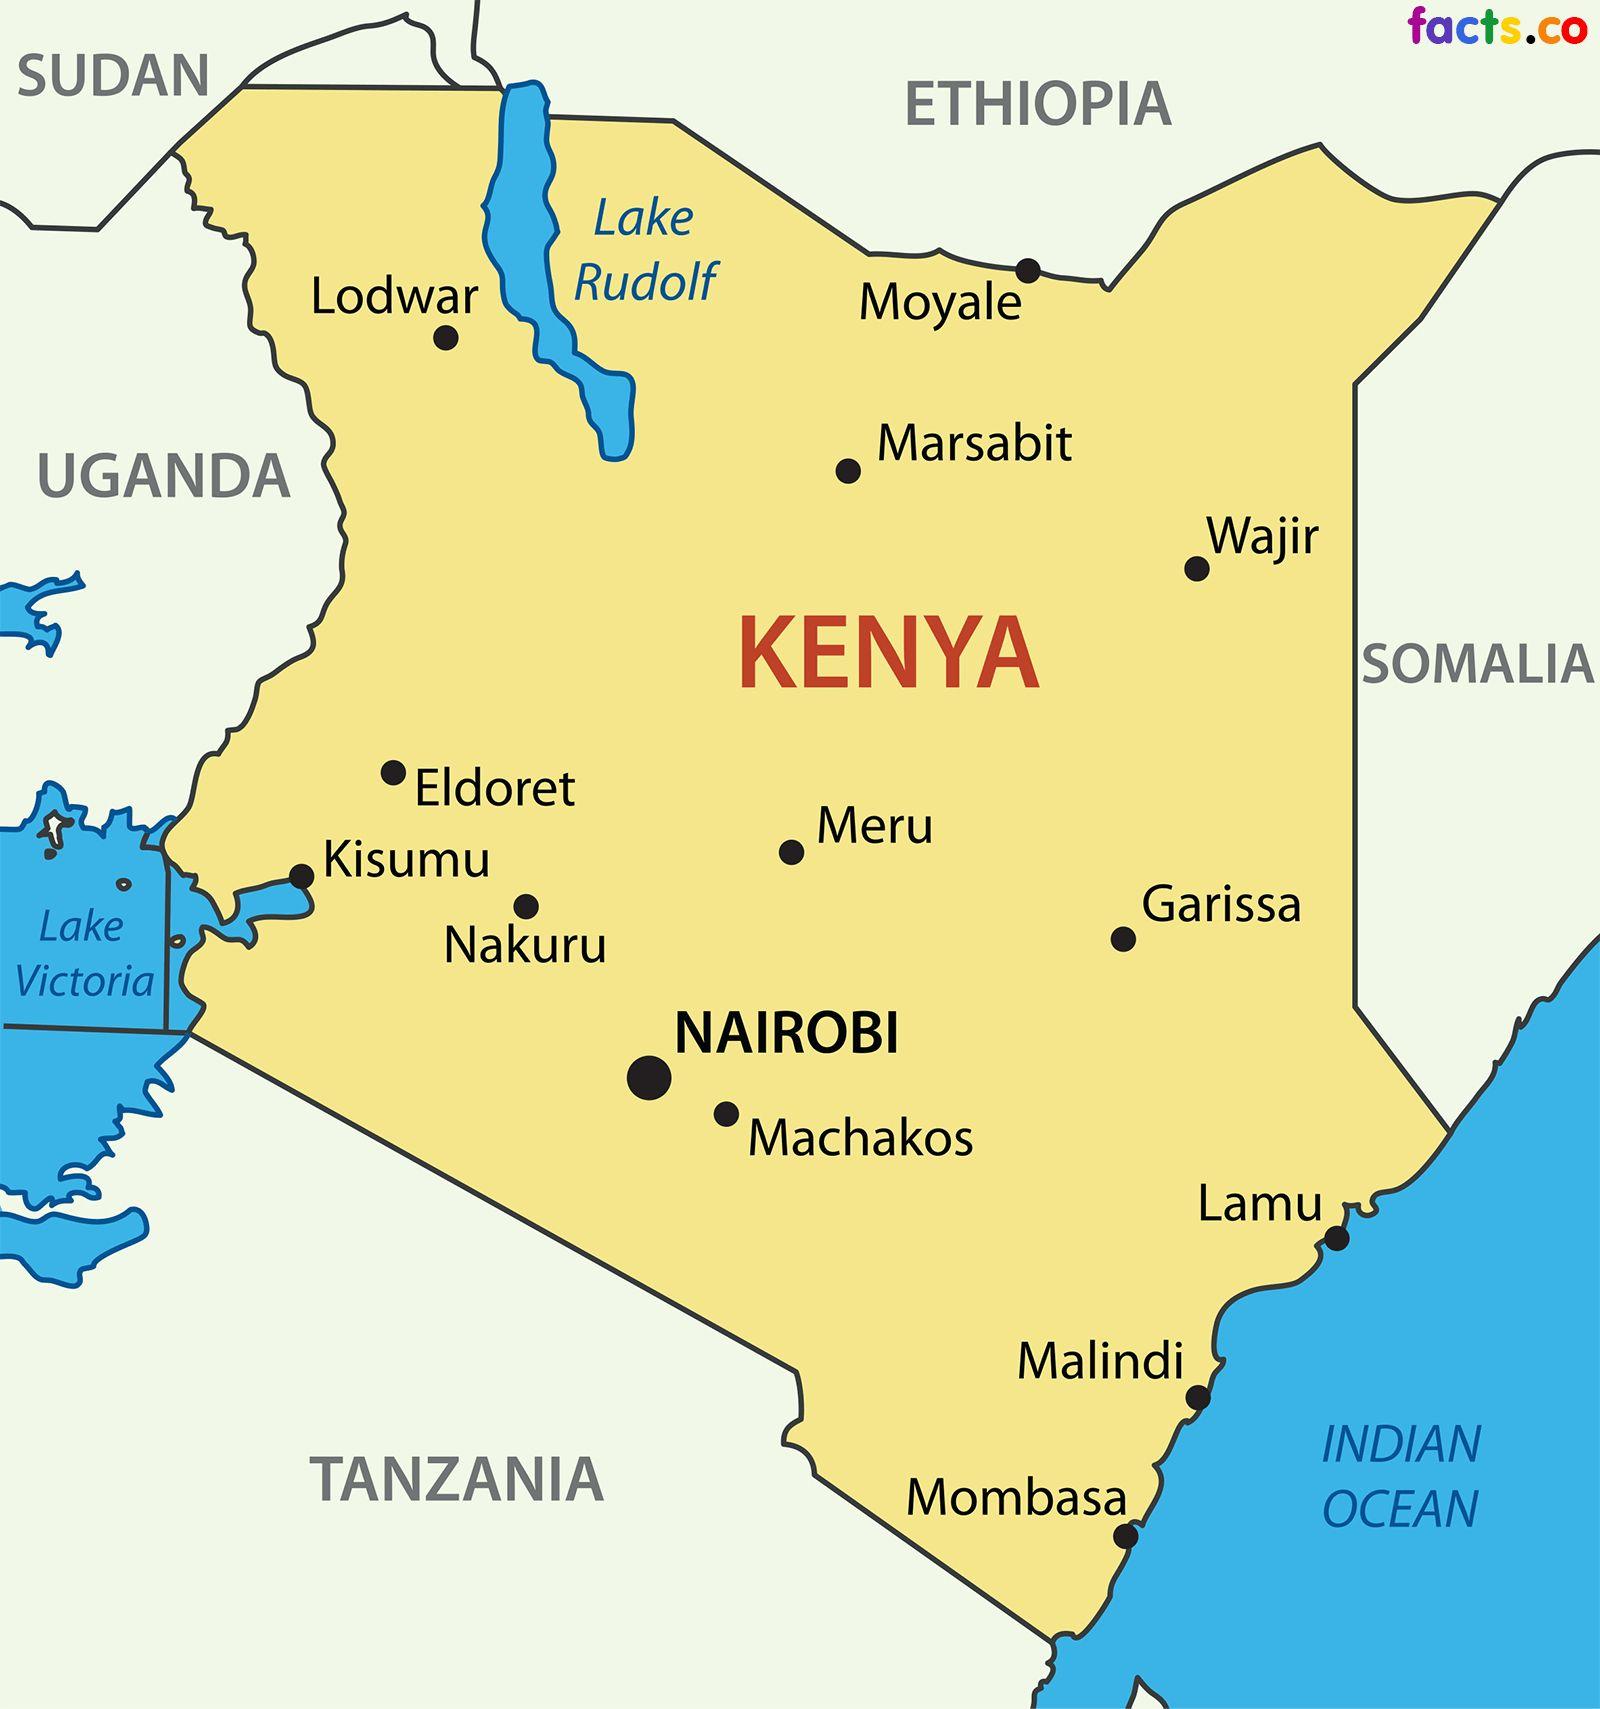 Eldoret & Kitali | Travel - Kenya | Pinterest | Kenya, Africa and ...